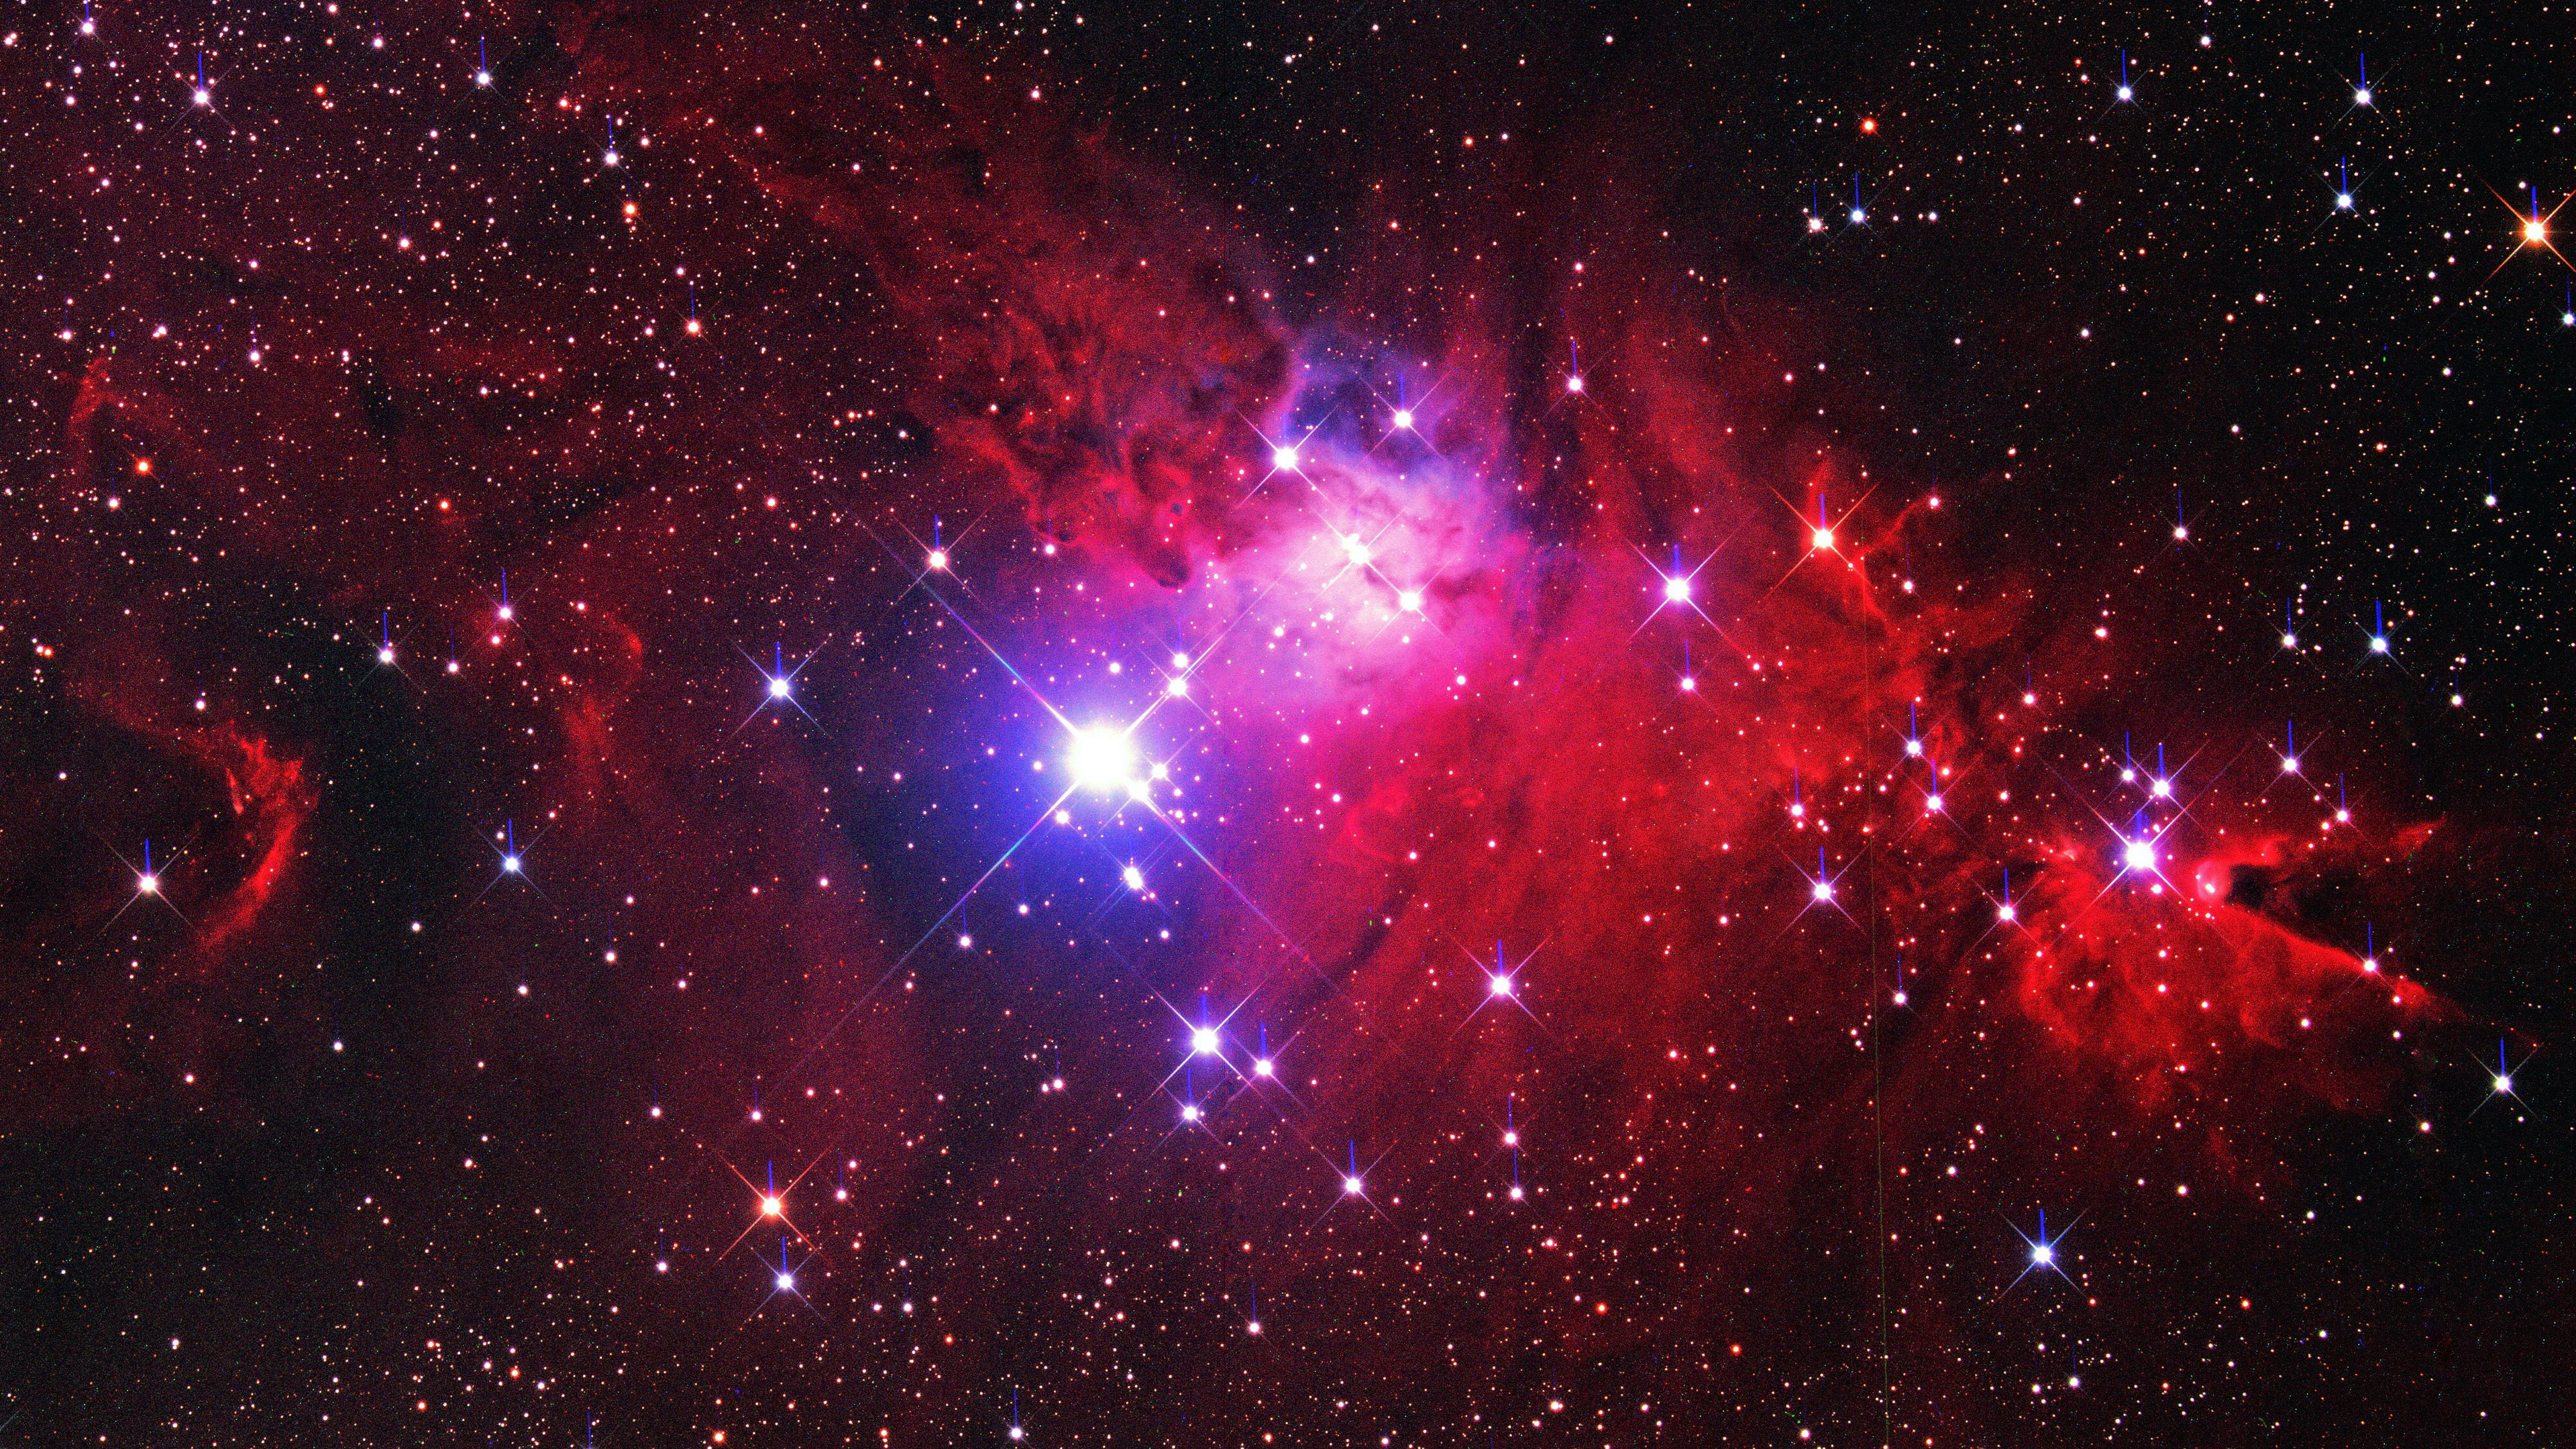 Stars Space 3840x2160